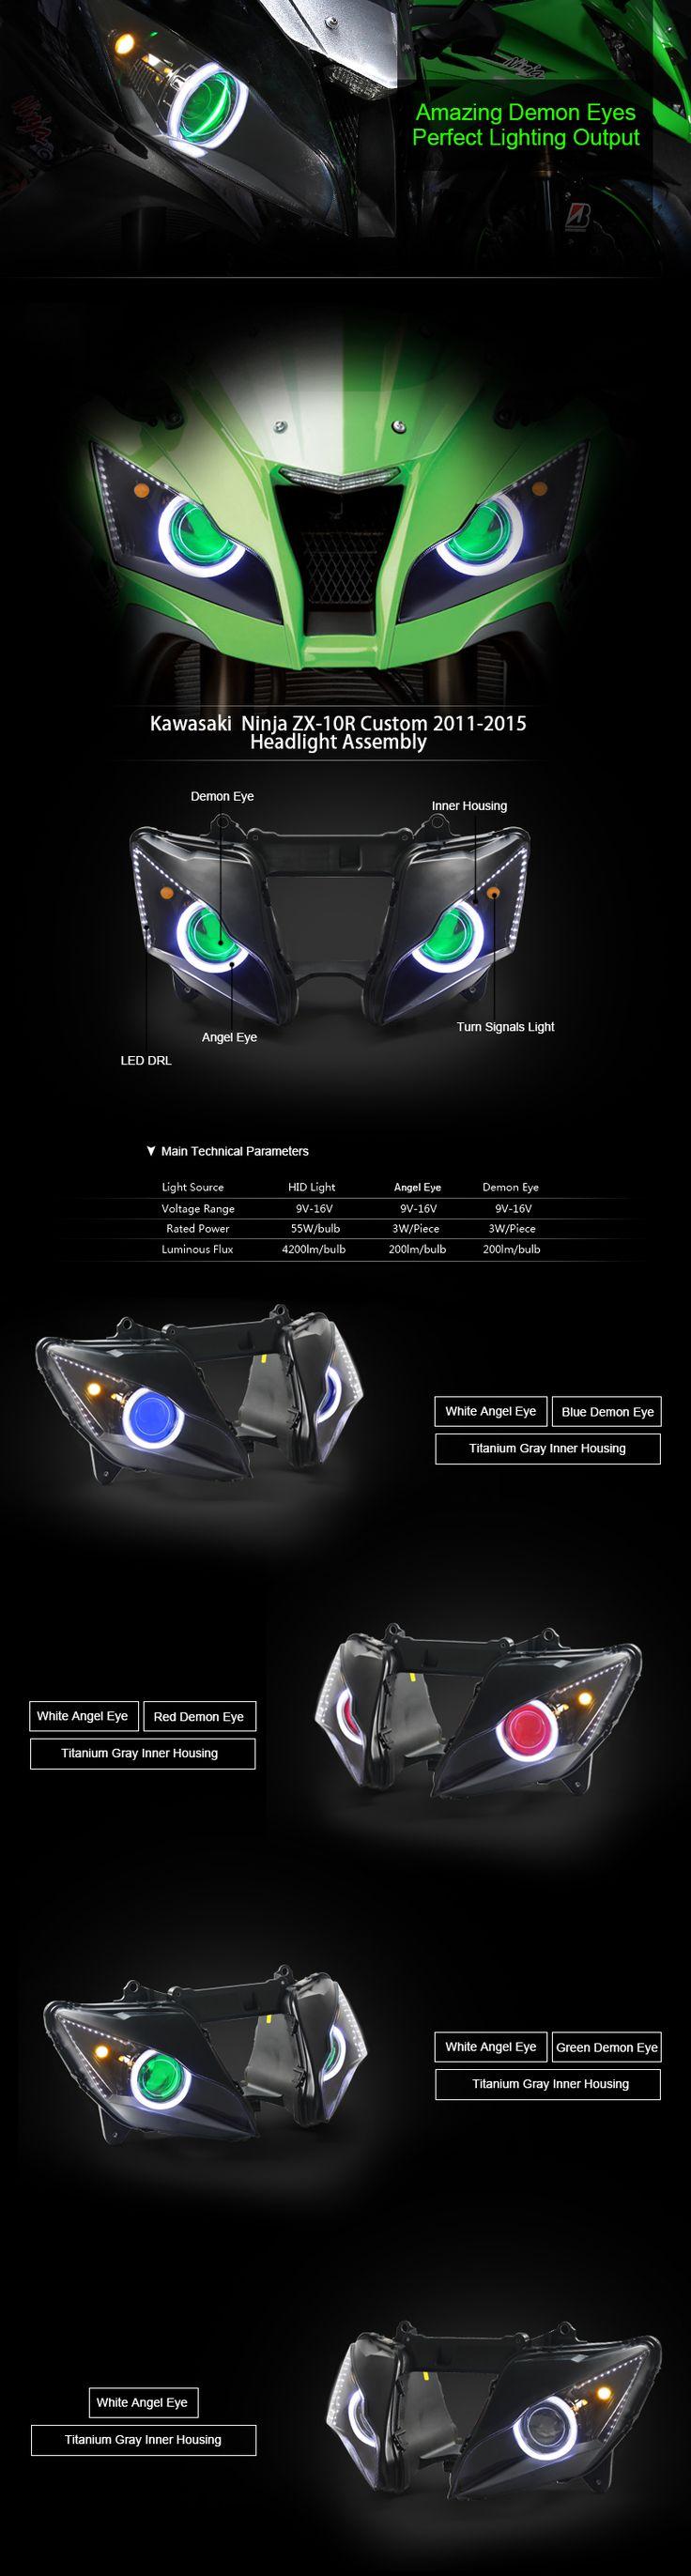 Kawasaki ninja zx 10r hid led headlight assembly 2011 2015